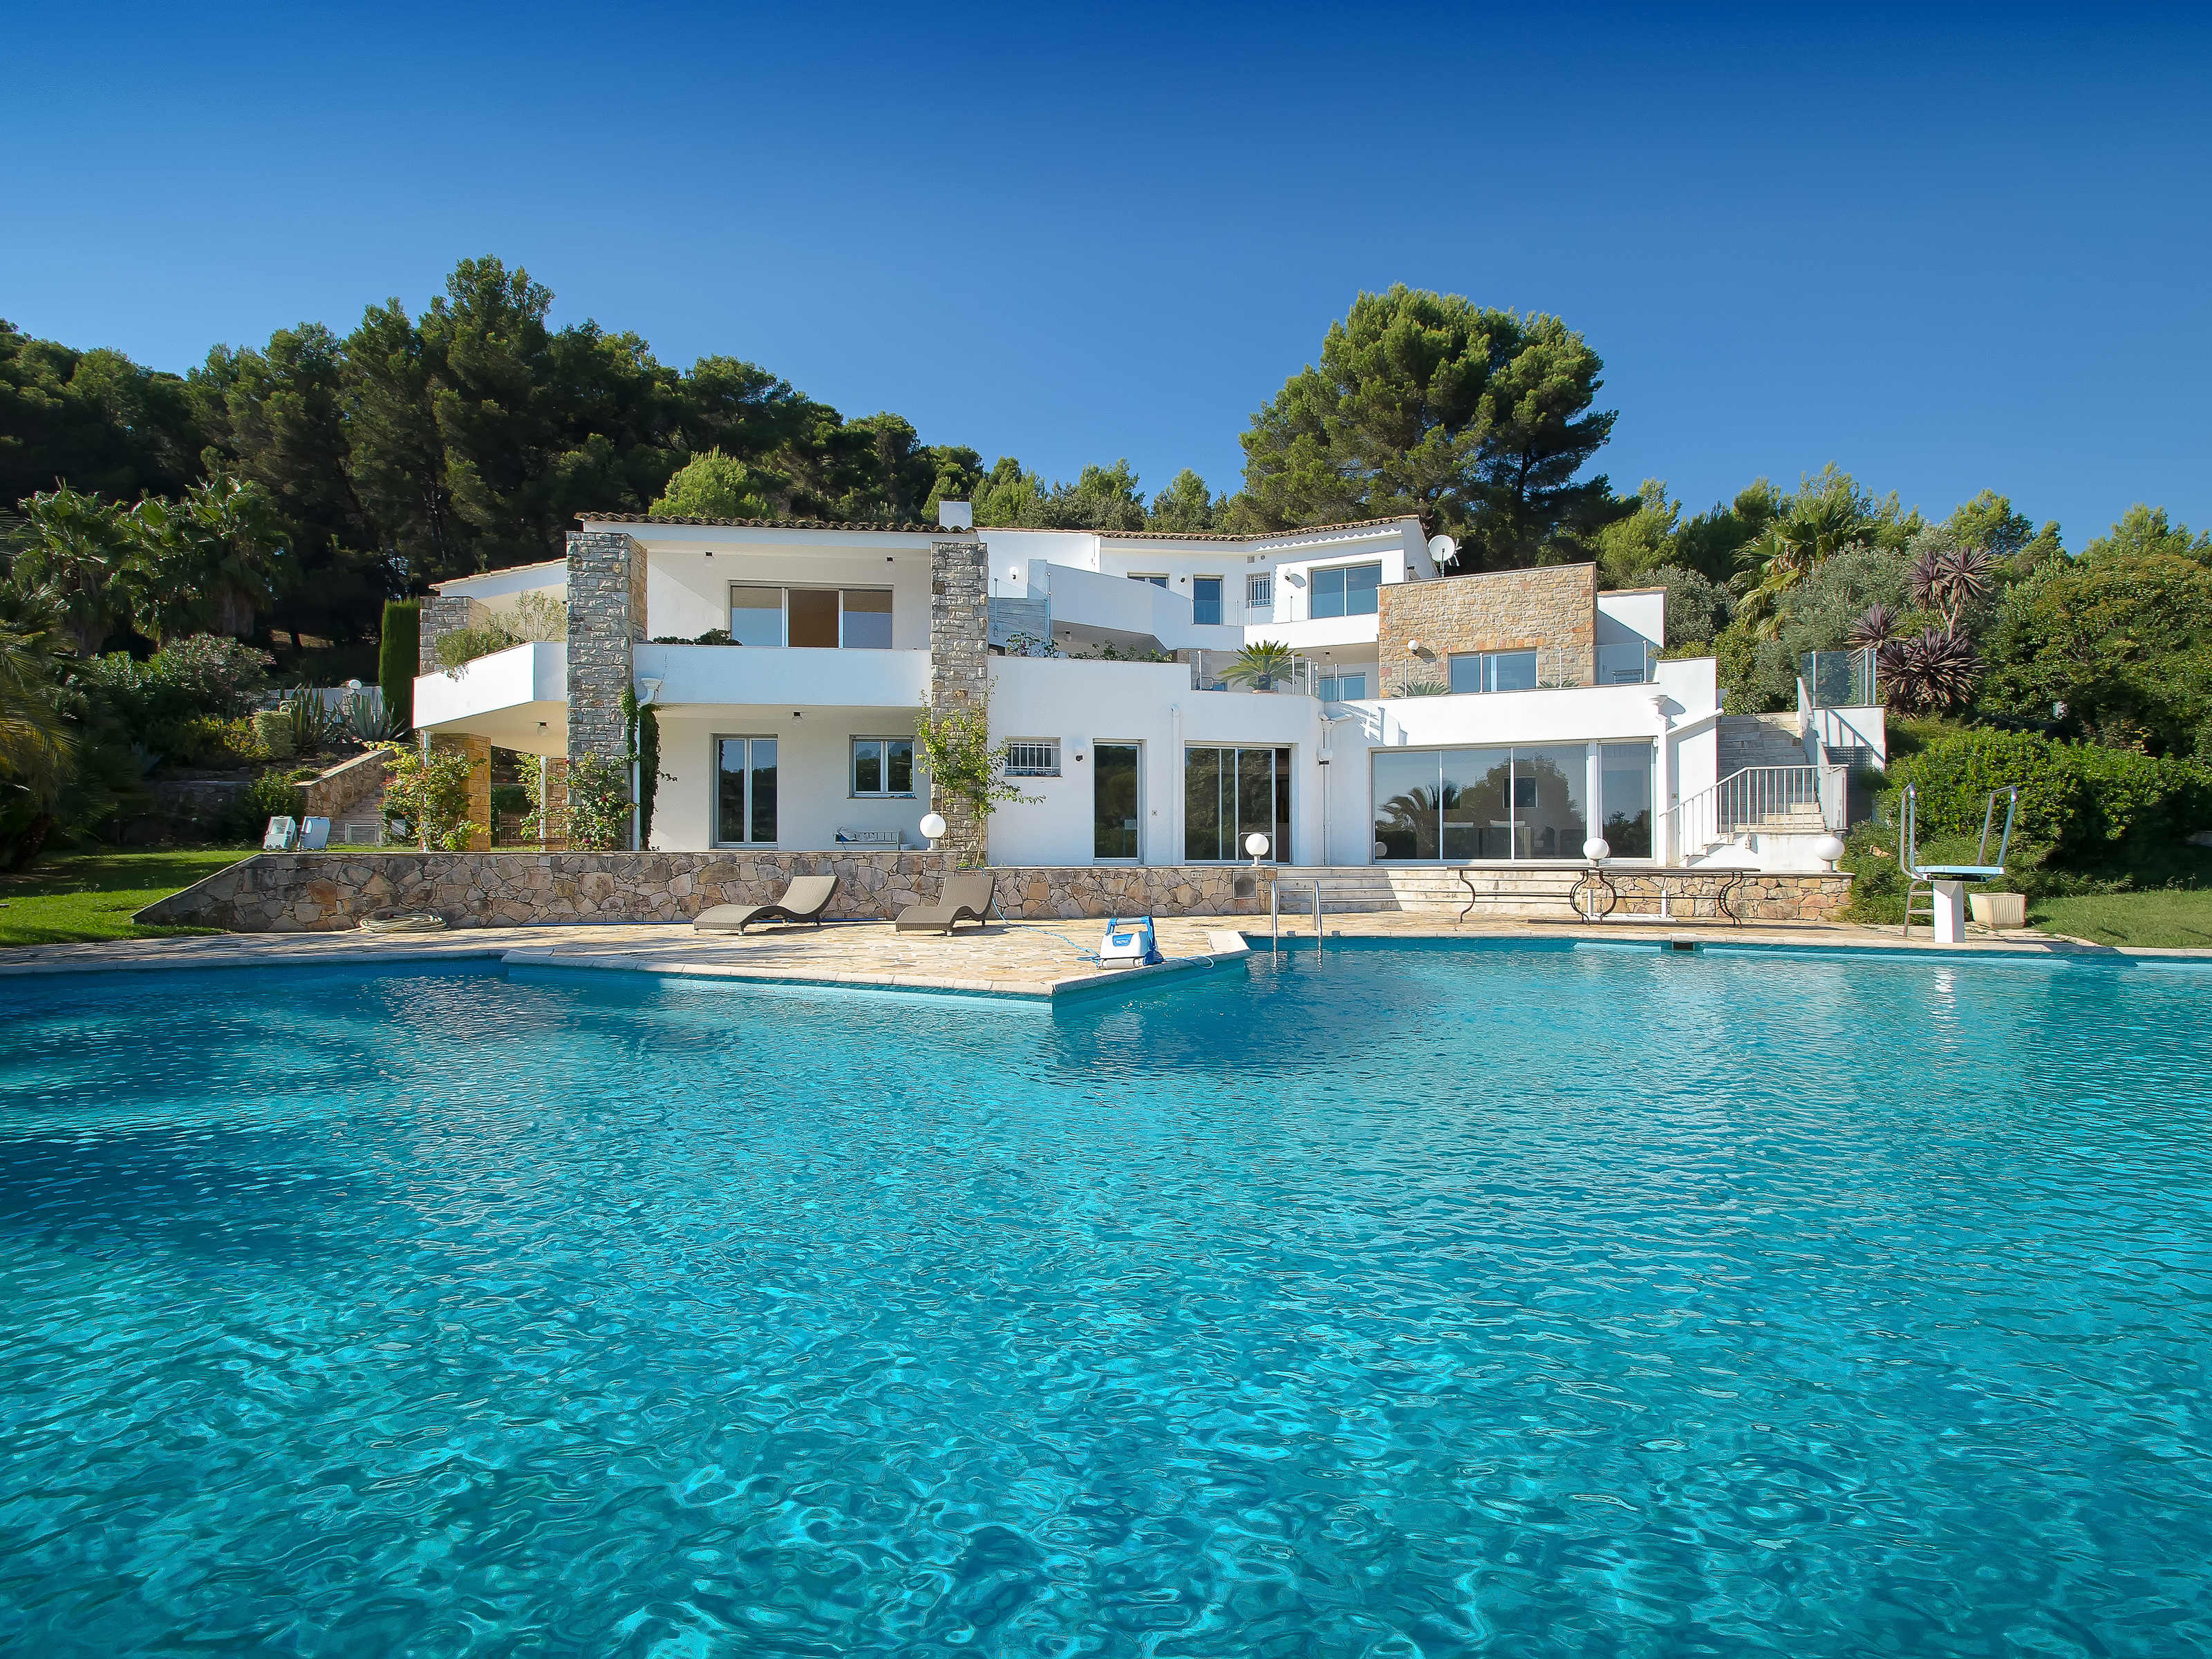 Other Residential for Sale at Villa Picart Mougins, Provence-Alpes-Cote D'Azur 06250 France